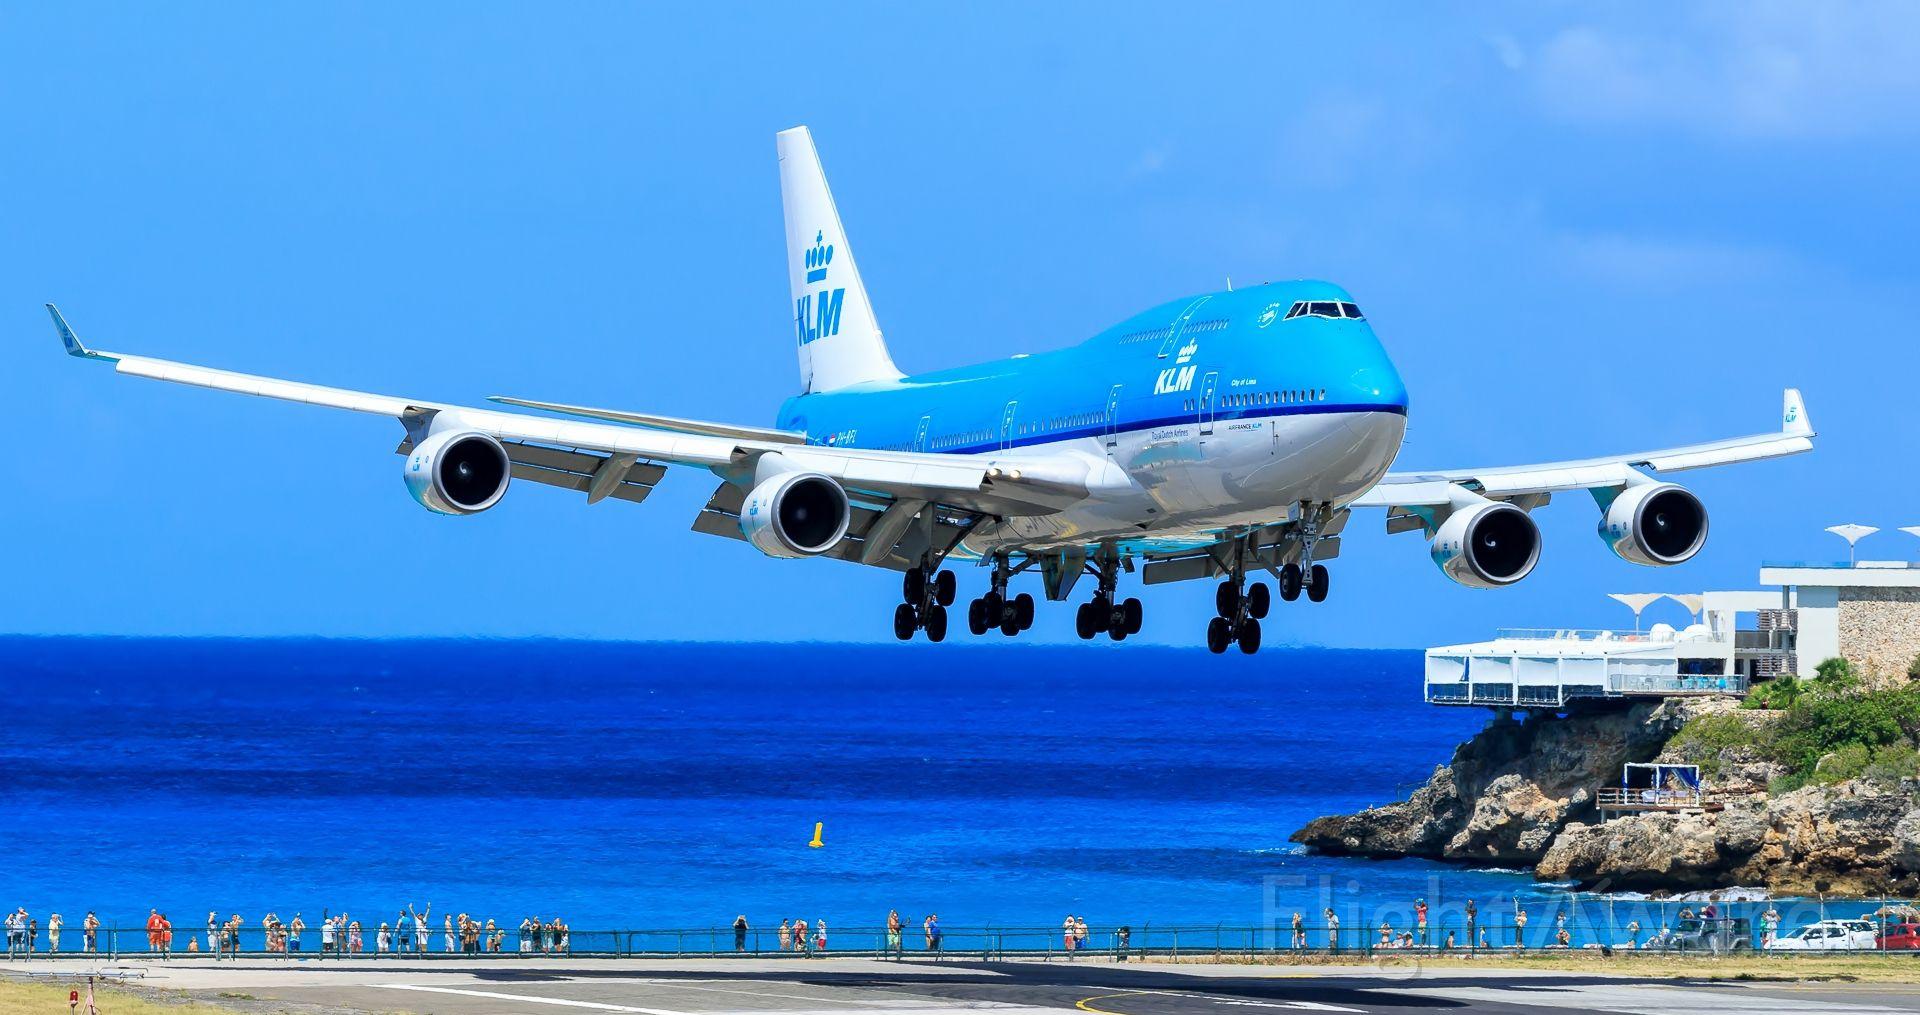 Boeing 747-400 (PH-BFL) - KLM landing at TNCM Sint Maarten over the maho beach.